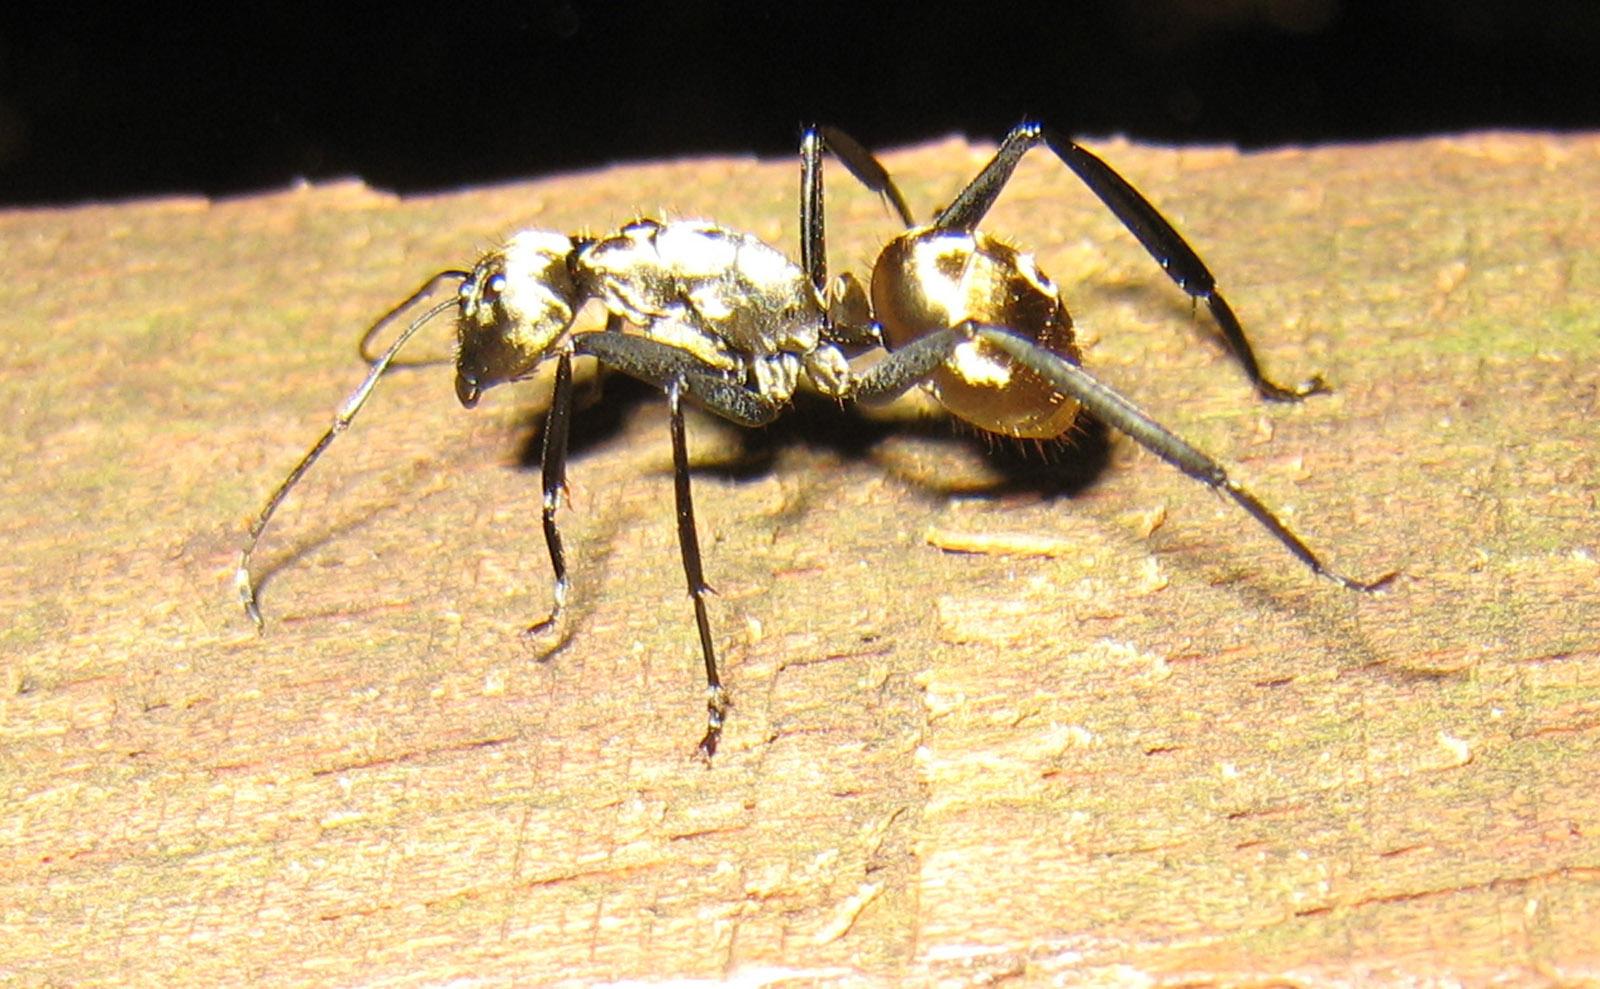 a shiny gold carpenter ant on a log